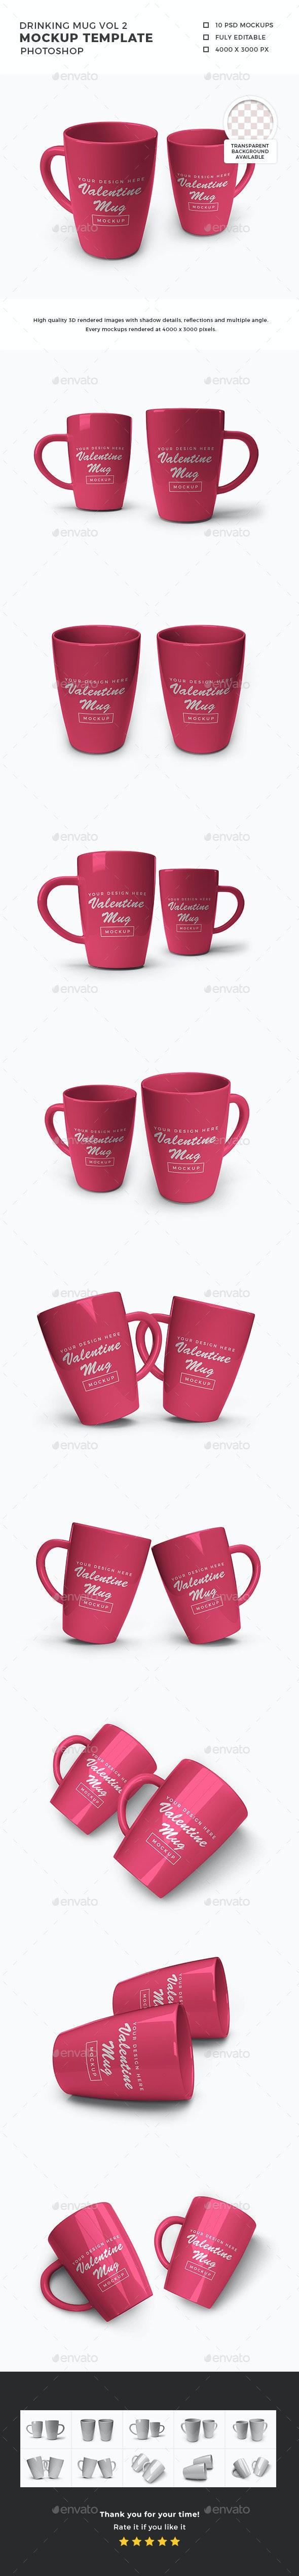 Drinking Mug Mockup Template Vol 2 - Food and Drink Packaging